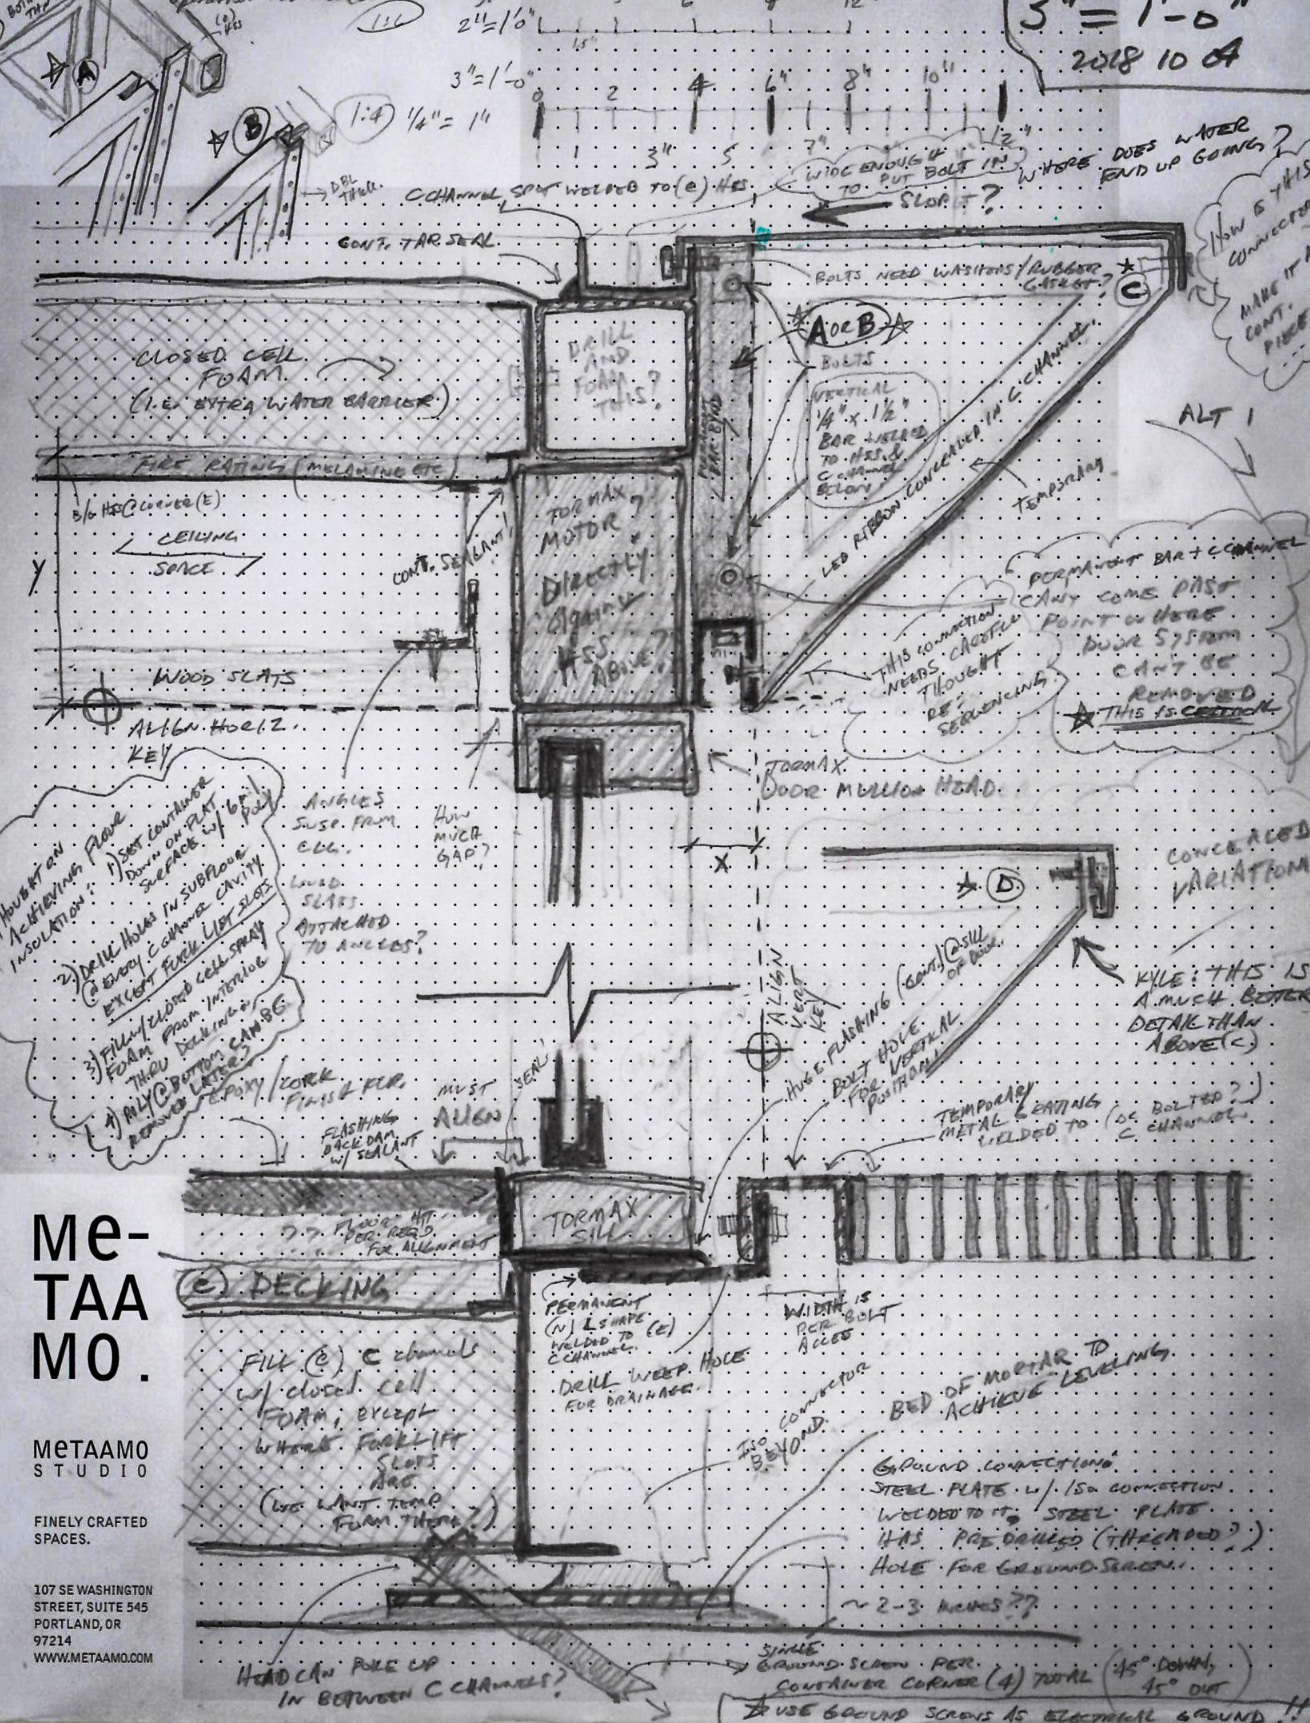 181004_details in flight sketch.jpg